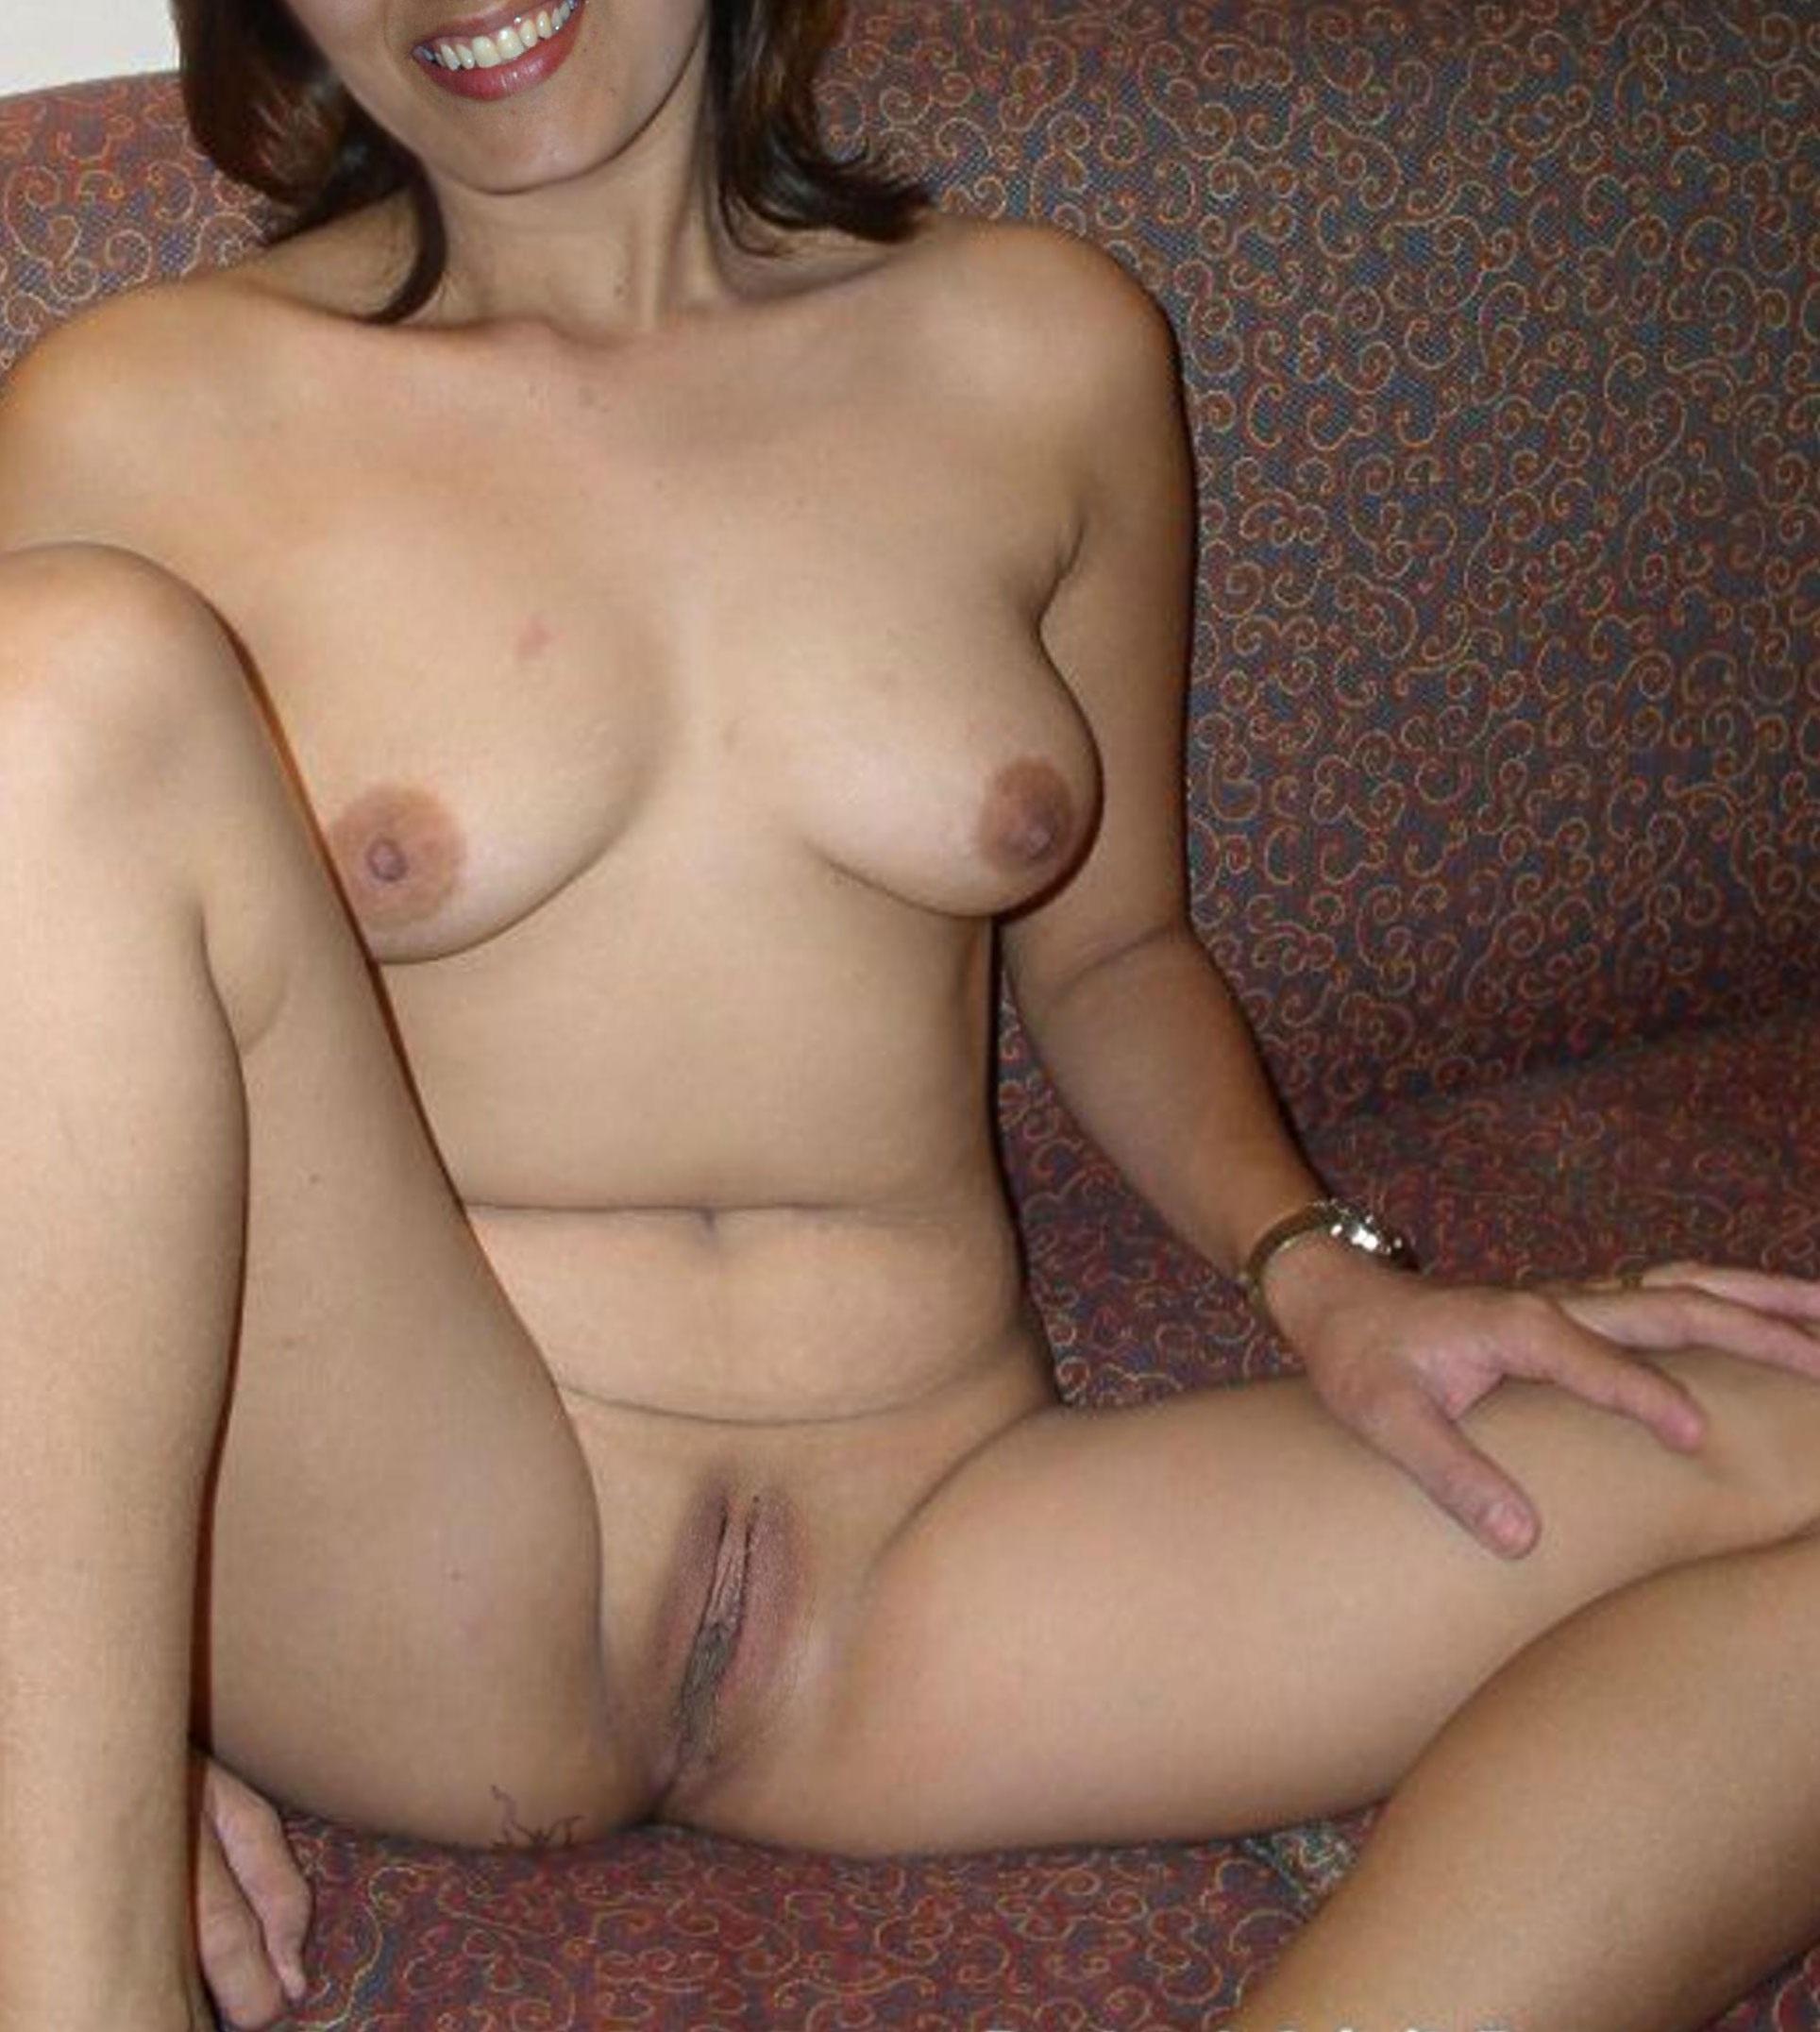 Desi Teens Exotic Private Nudes XXX Porn Pictures